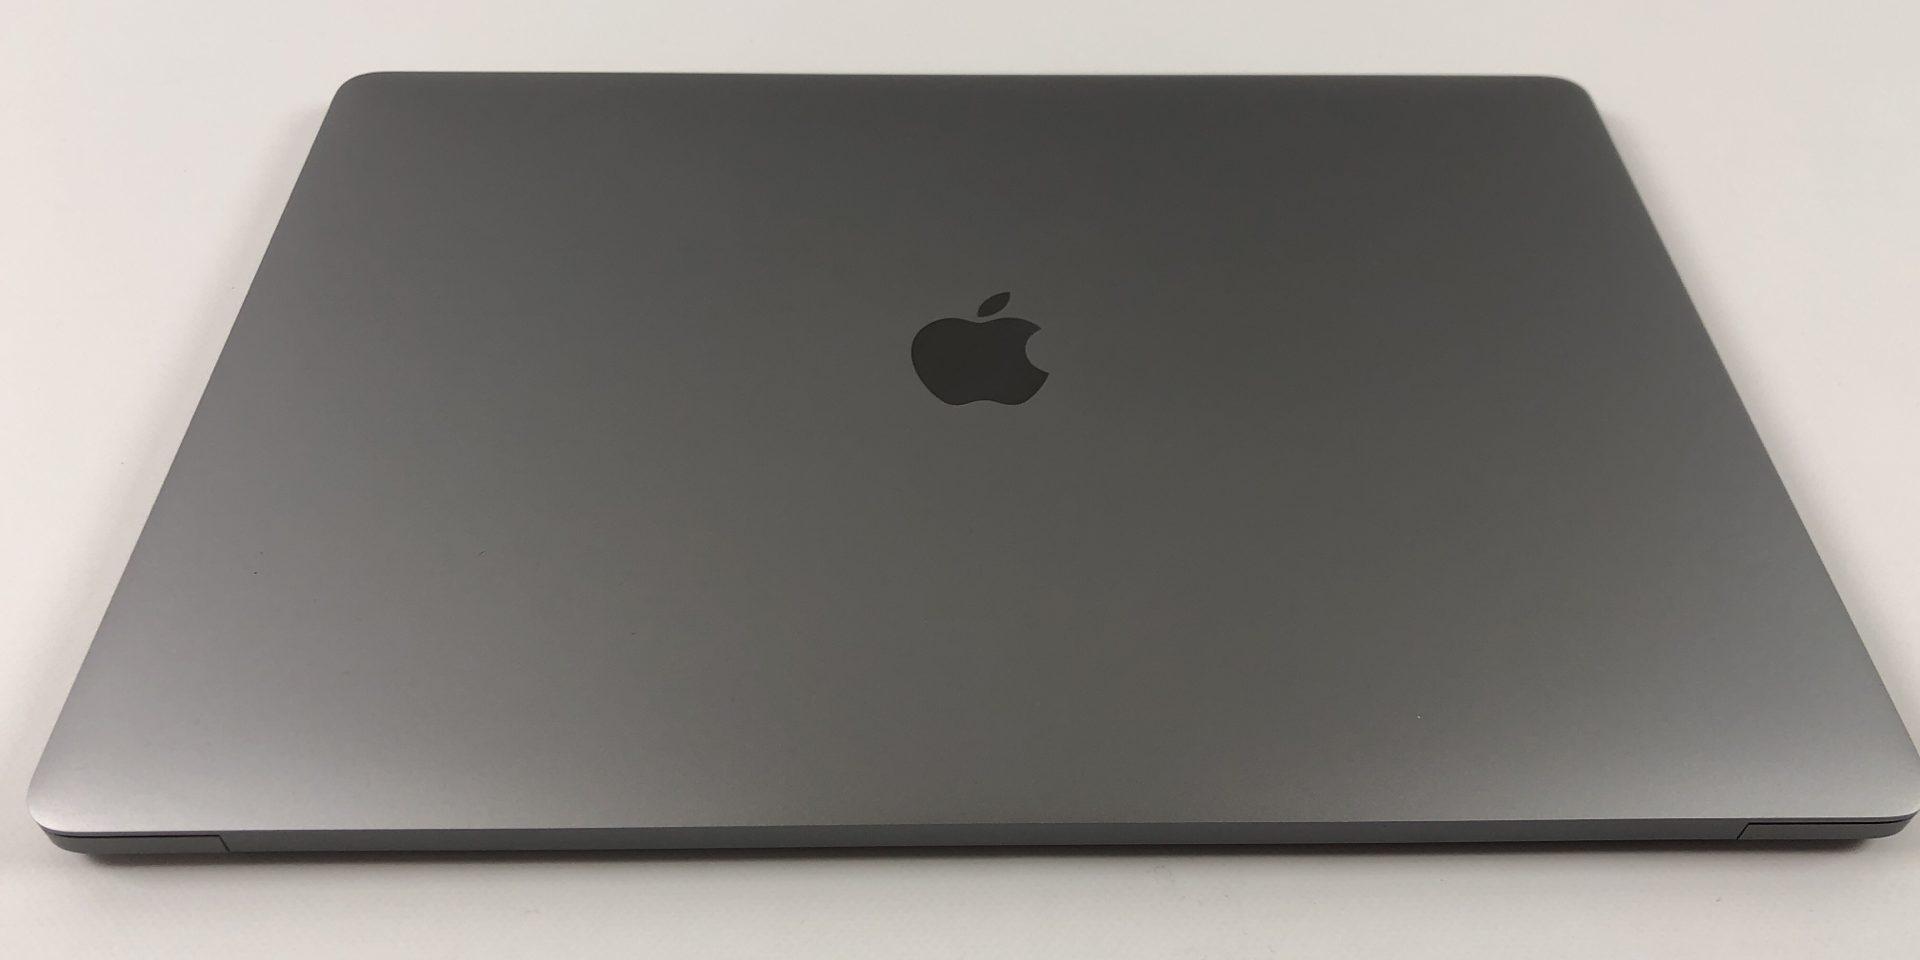 "MacBook Pro 15"" Touch Bar Mid 2018 (Intel 6-Core i7 2.2 GHz 16 GB RAM 256 GB SSD), Space Gray, Intel 6-Core i7 2.2 GHz, 16 GB RAM, 256 GB SSD, imagen 2"